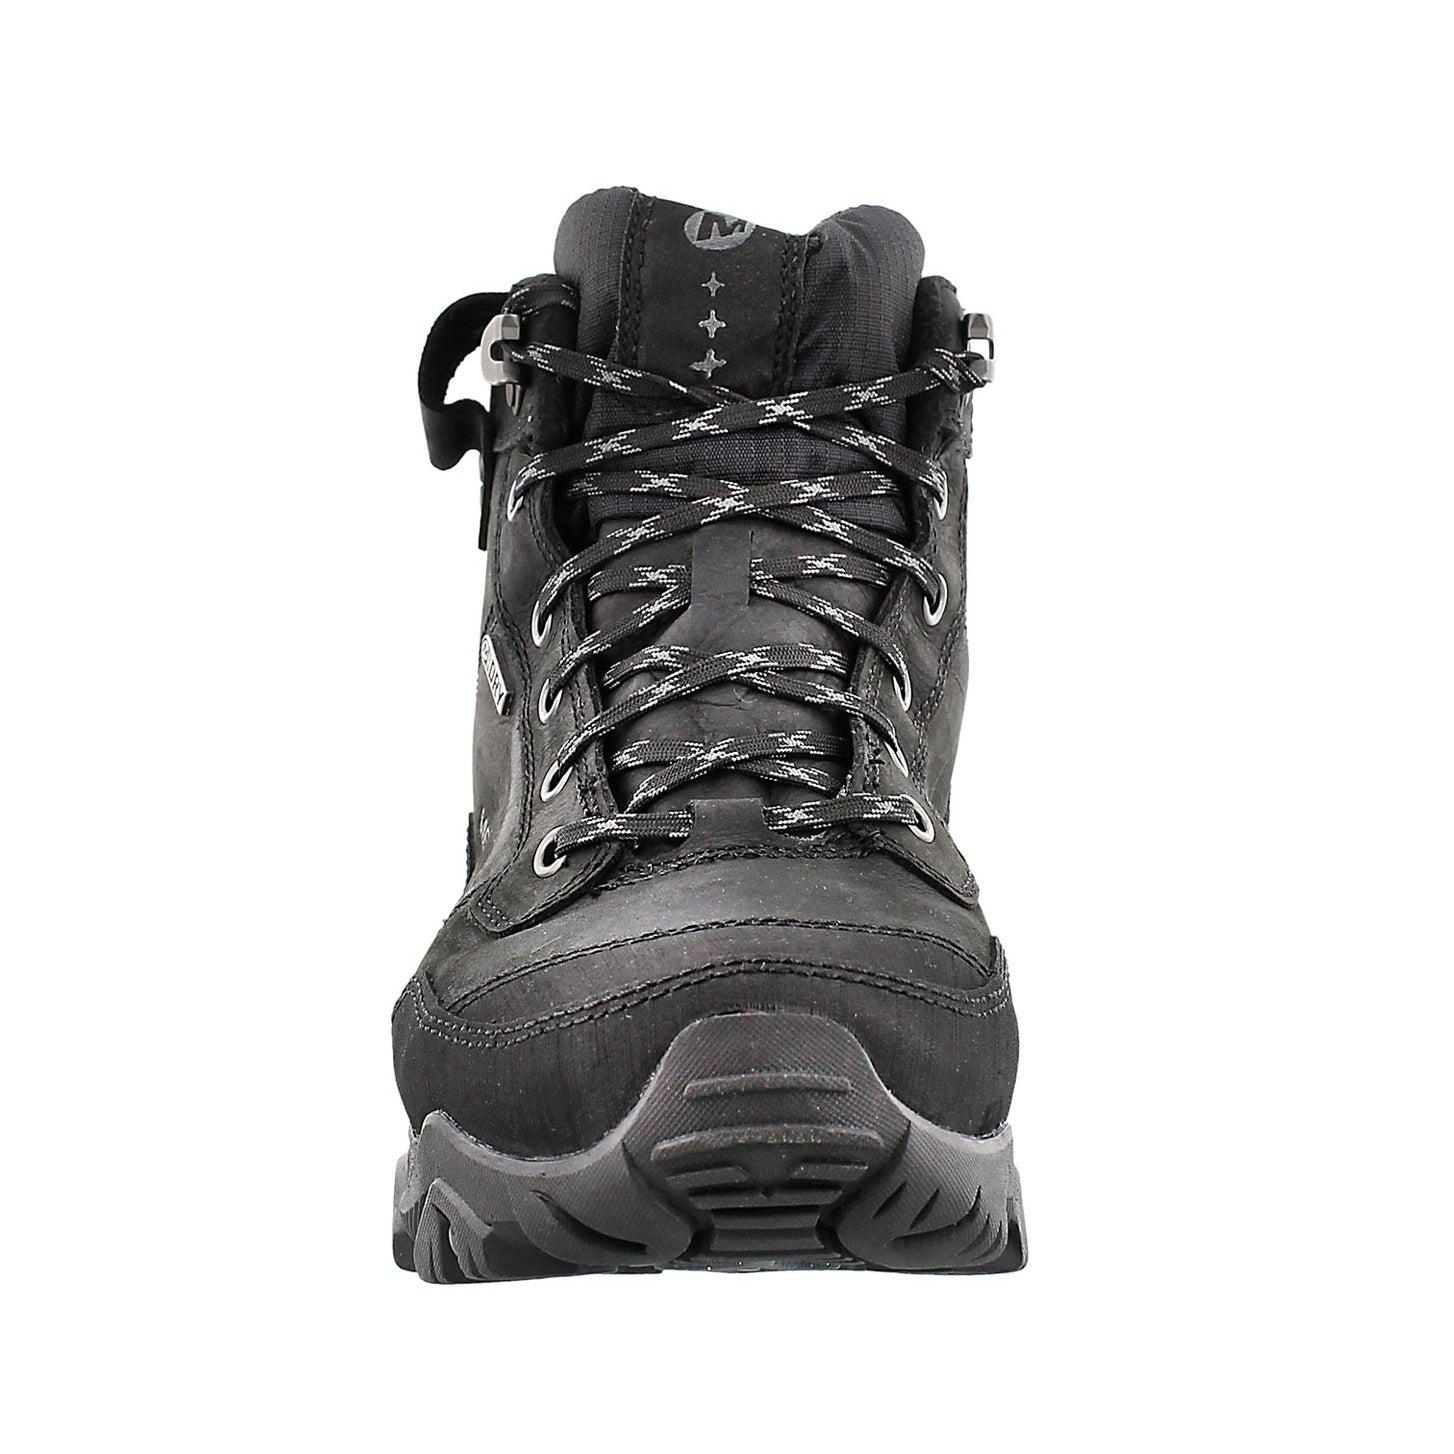 Mns Polarand Rove blk wtrpf lace up boot